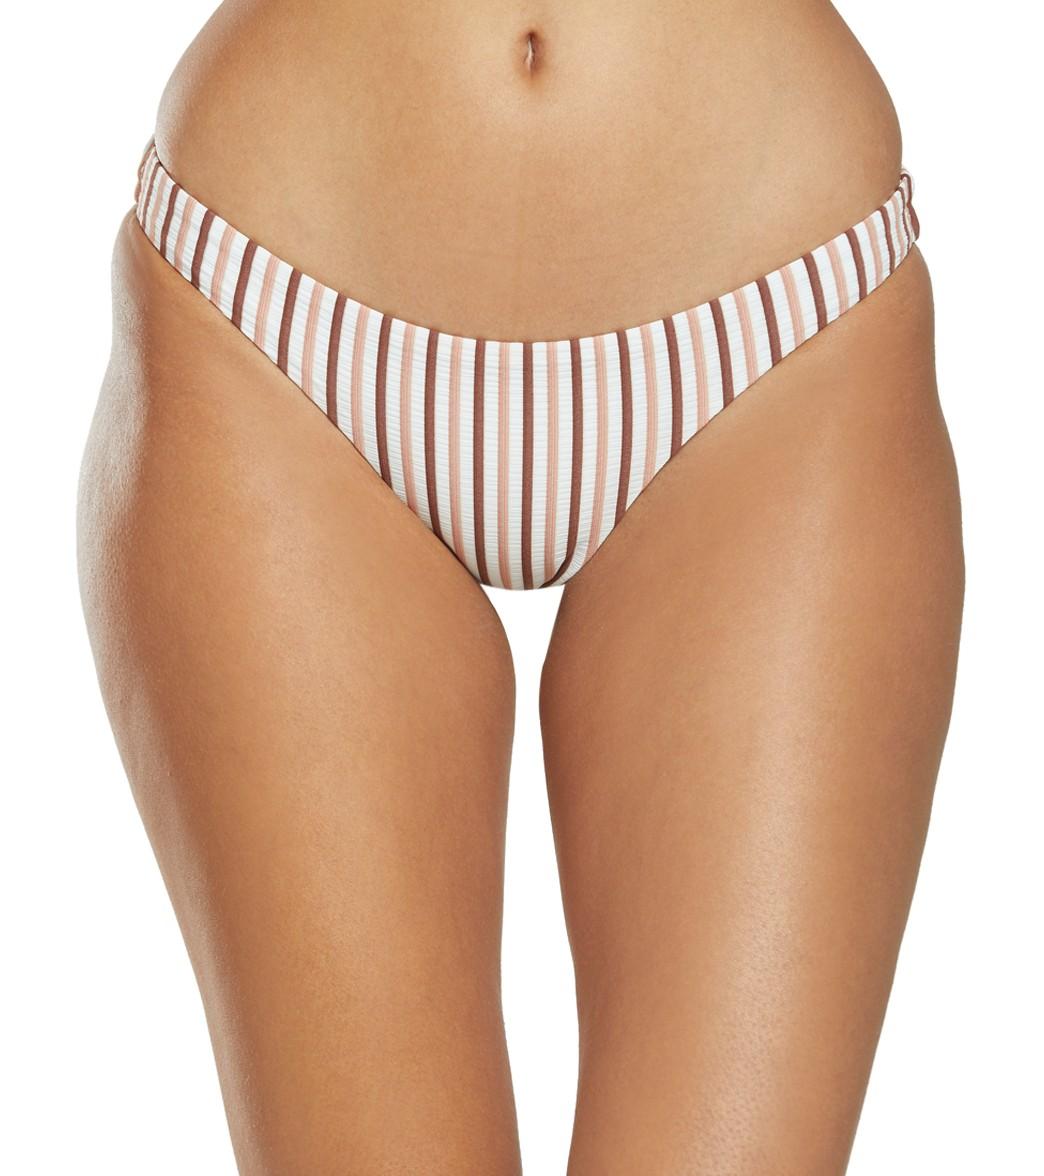 Tigerlily Tami Tiger Bikini Bottom